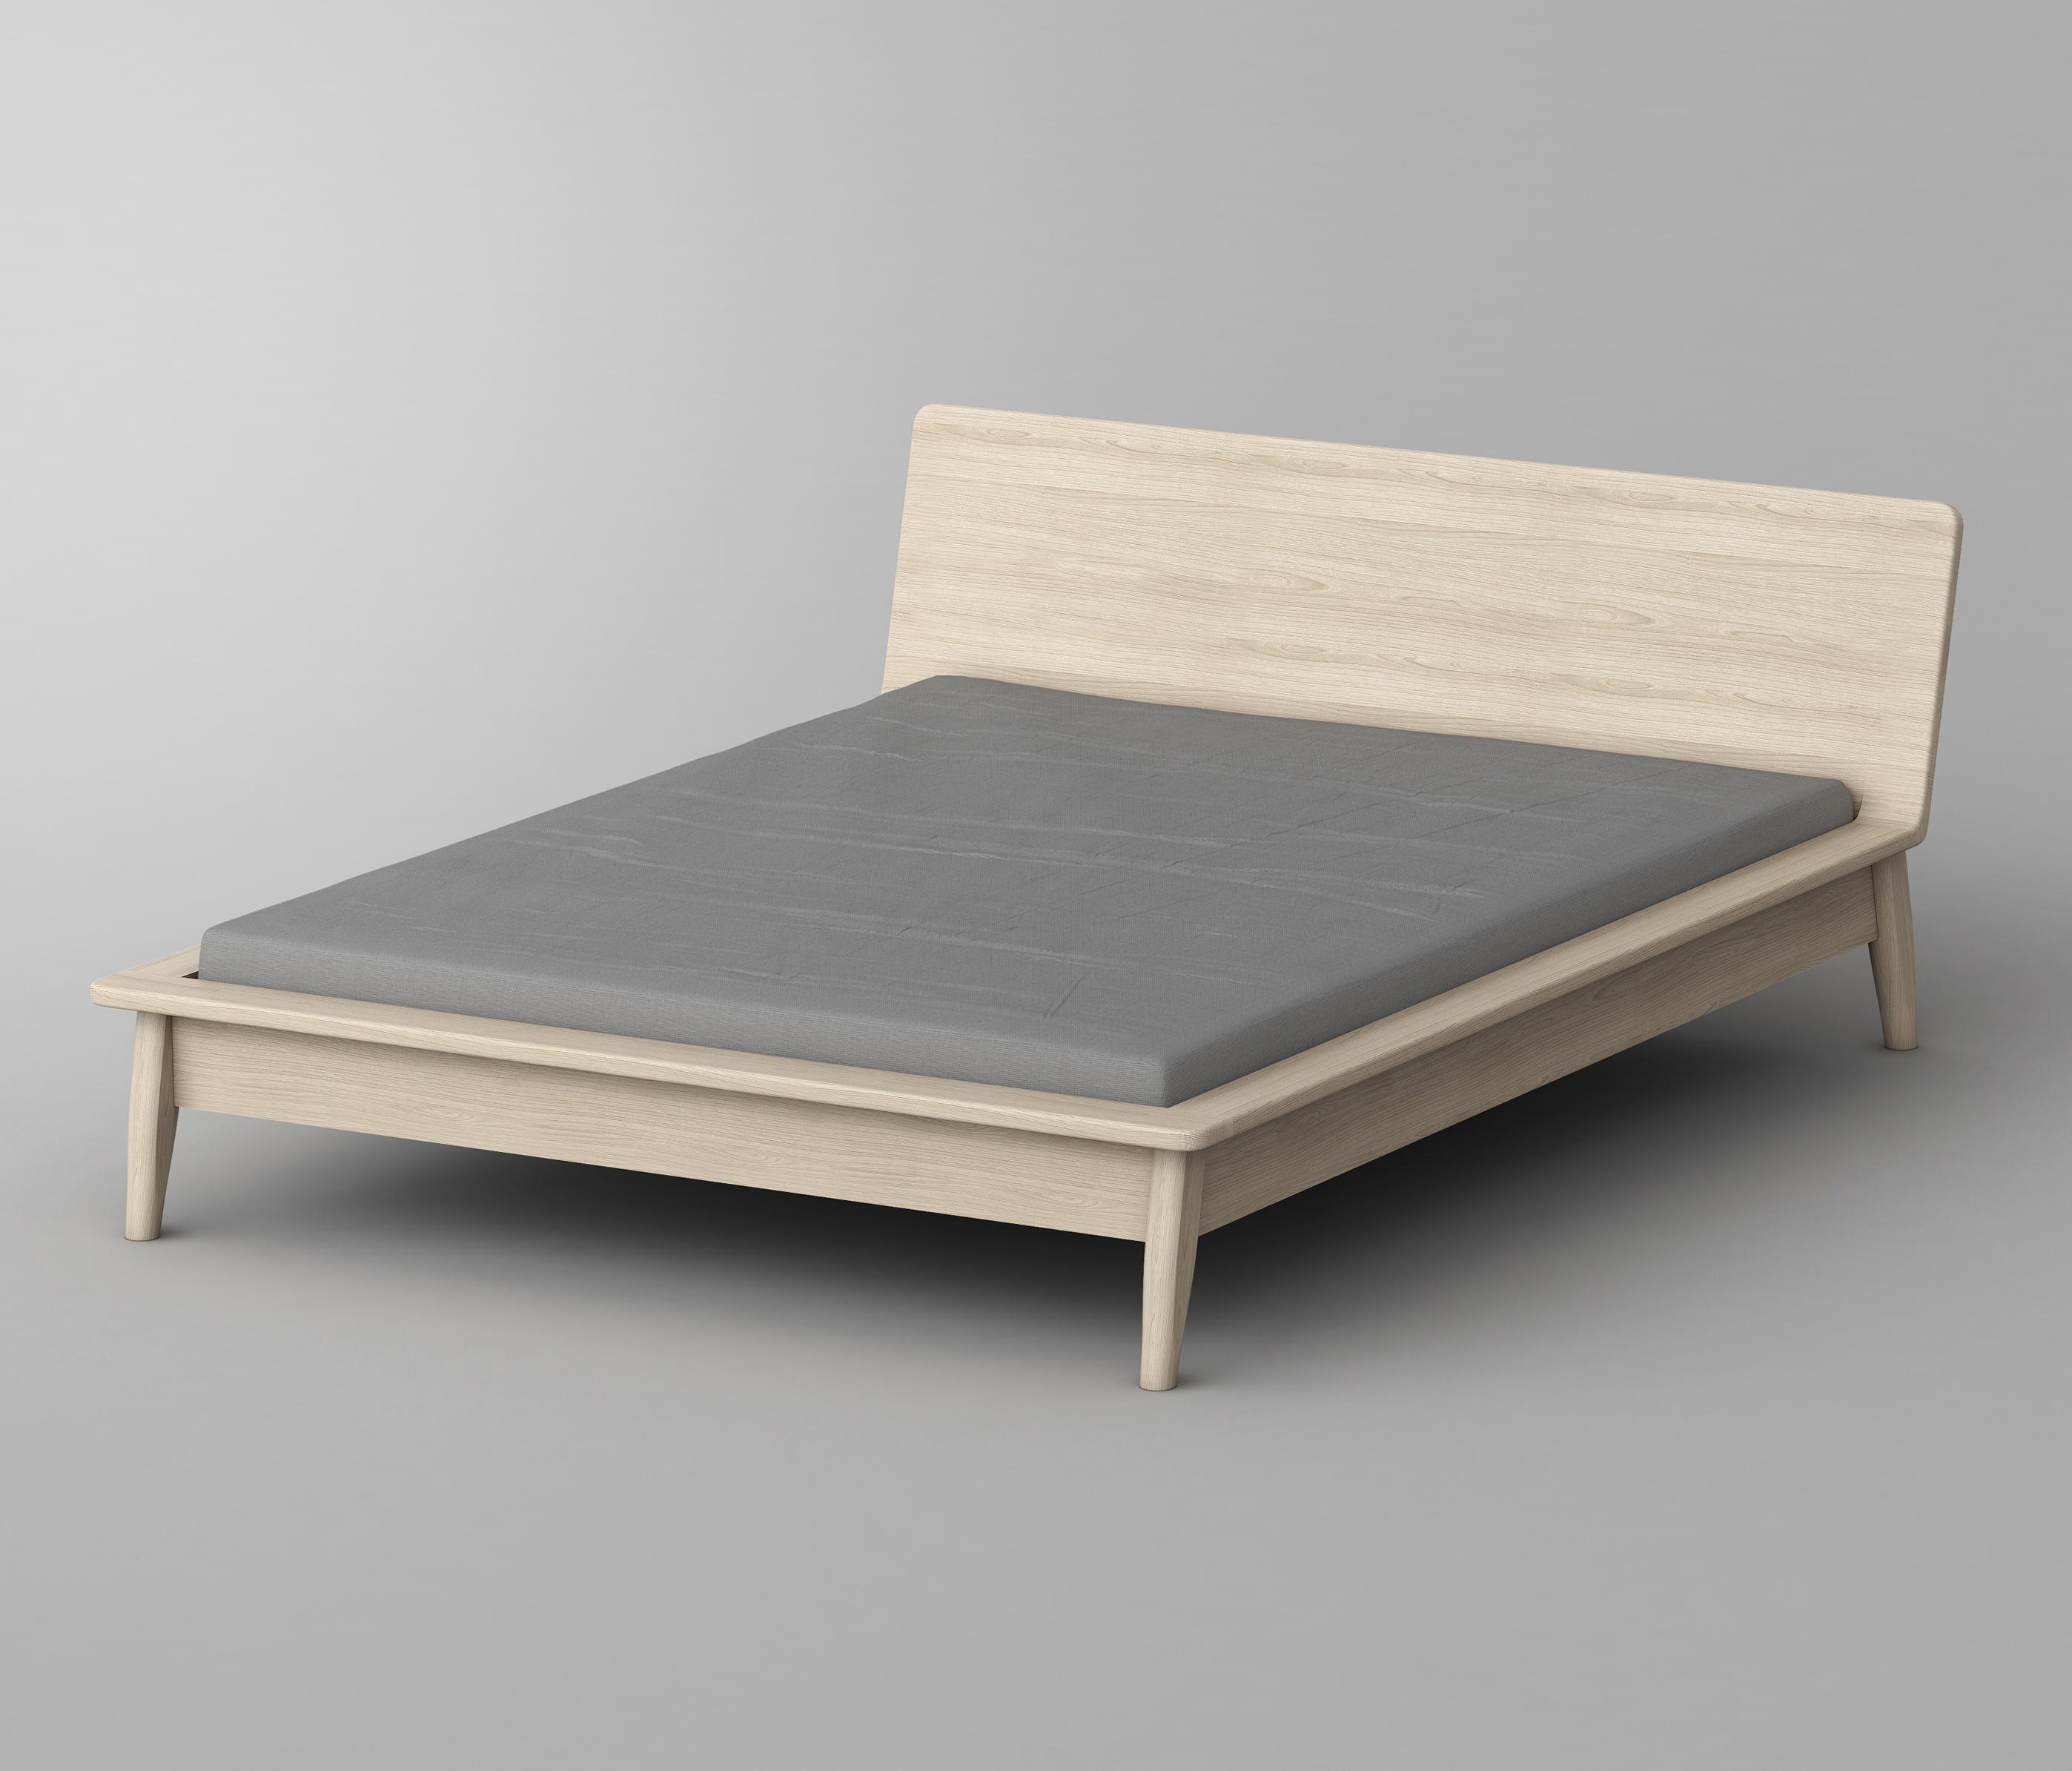 design bett. Black Bedroom Furniture Sets. Home Design Ideas